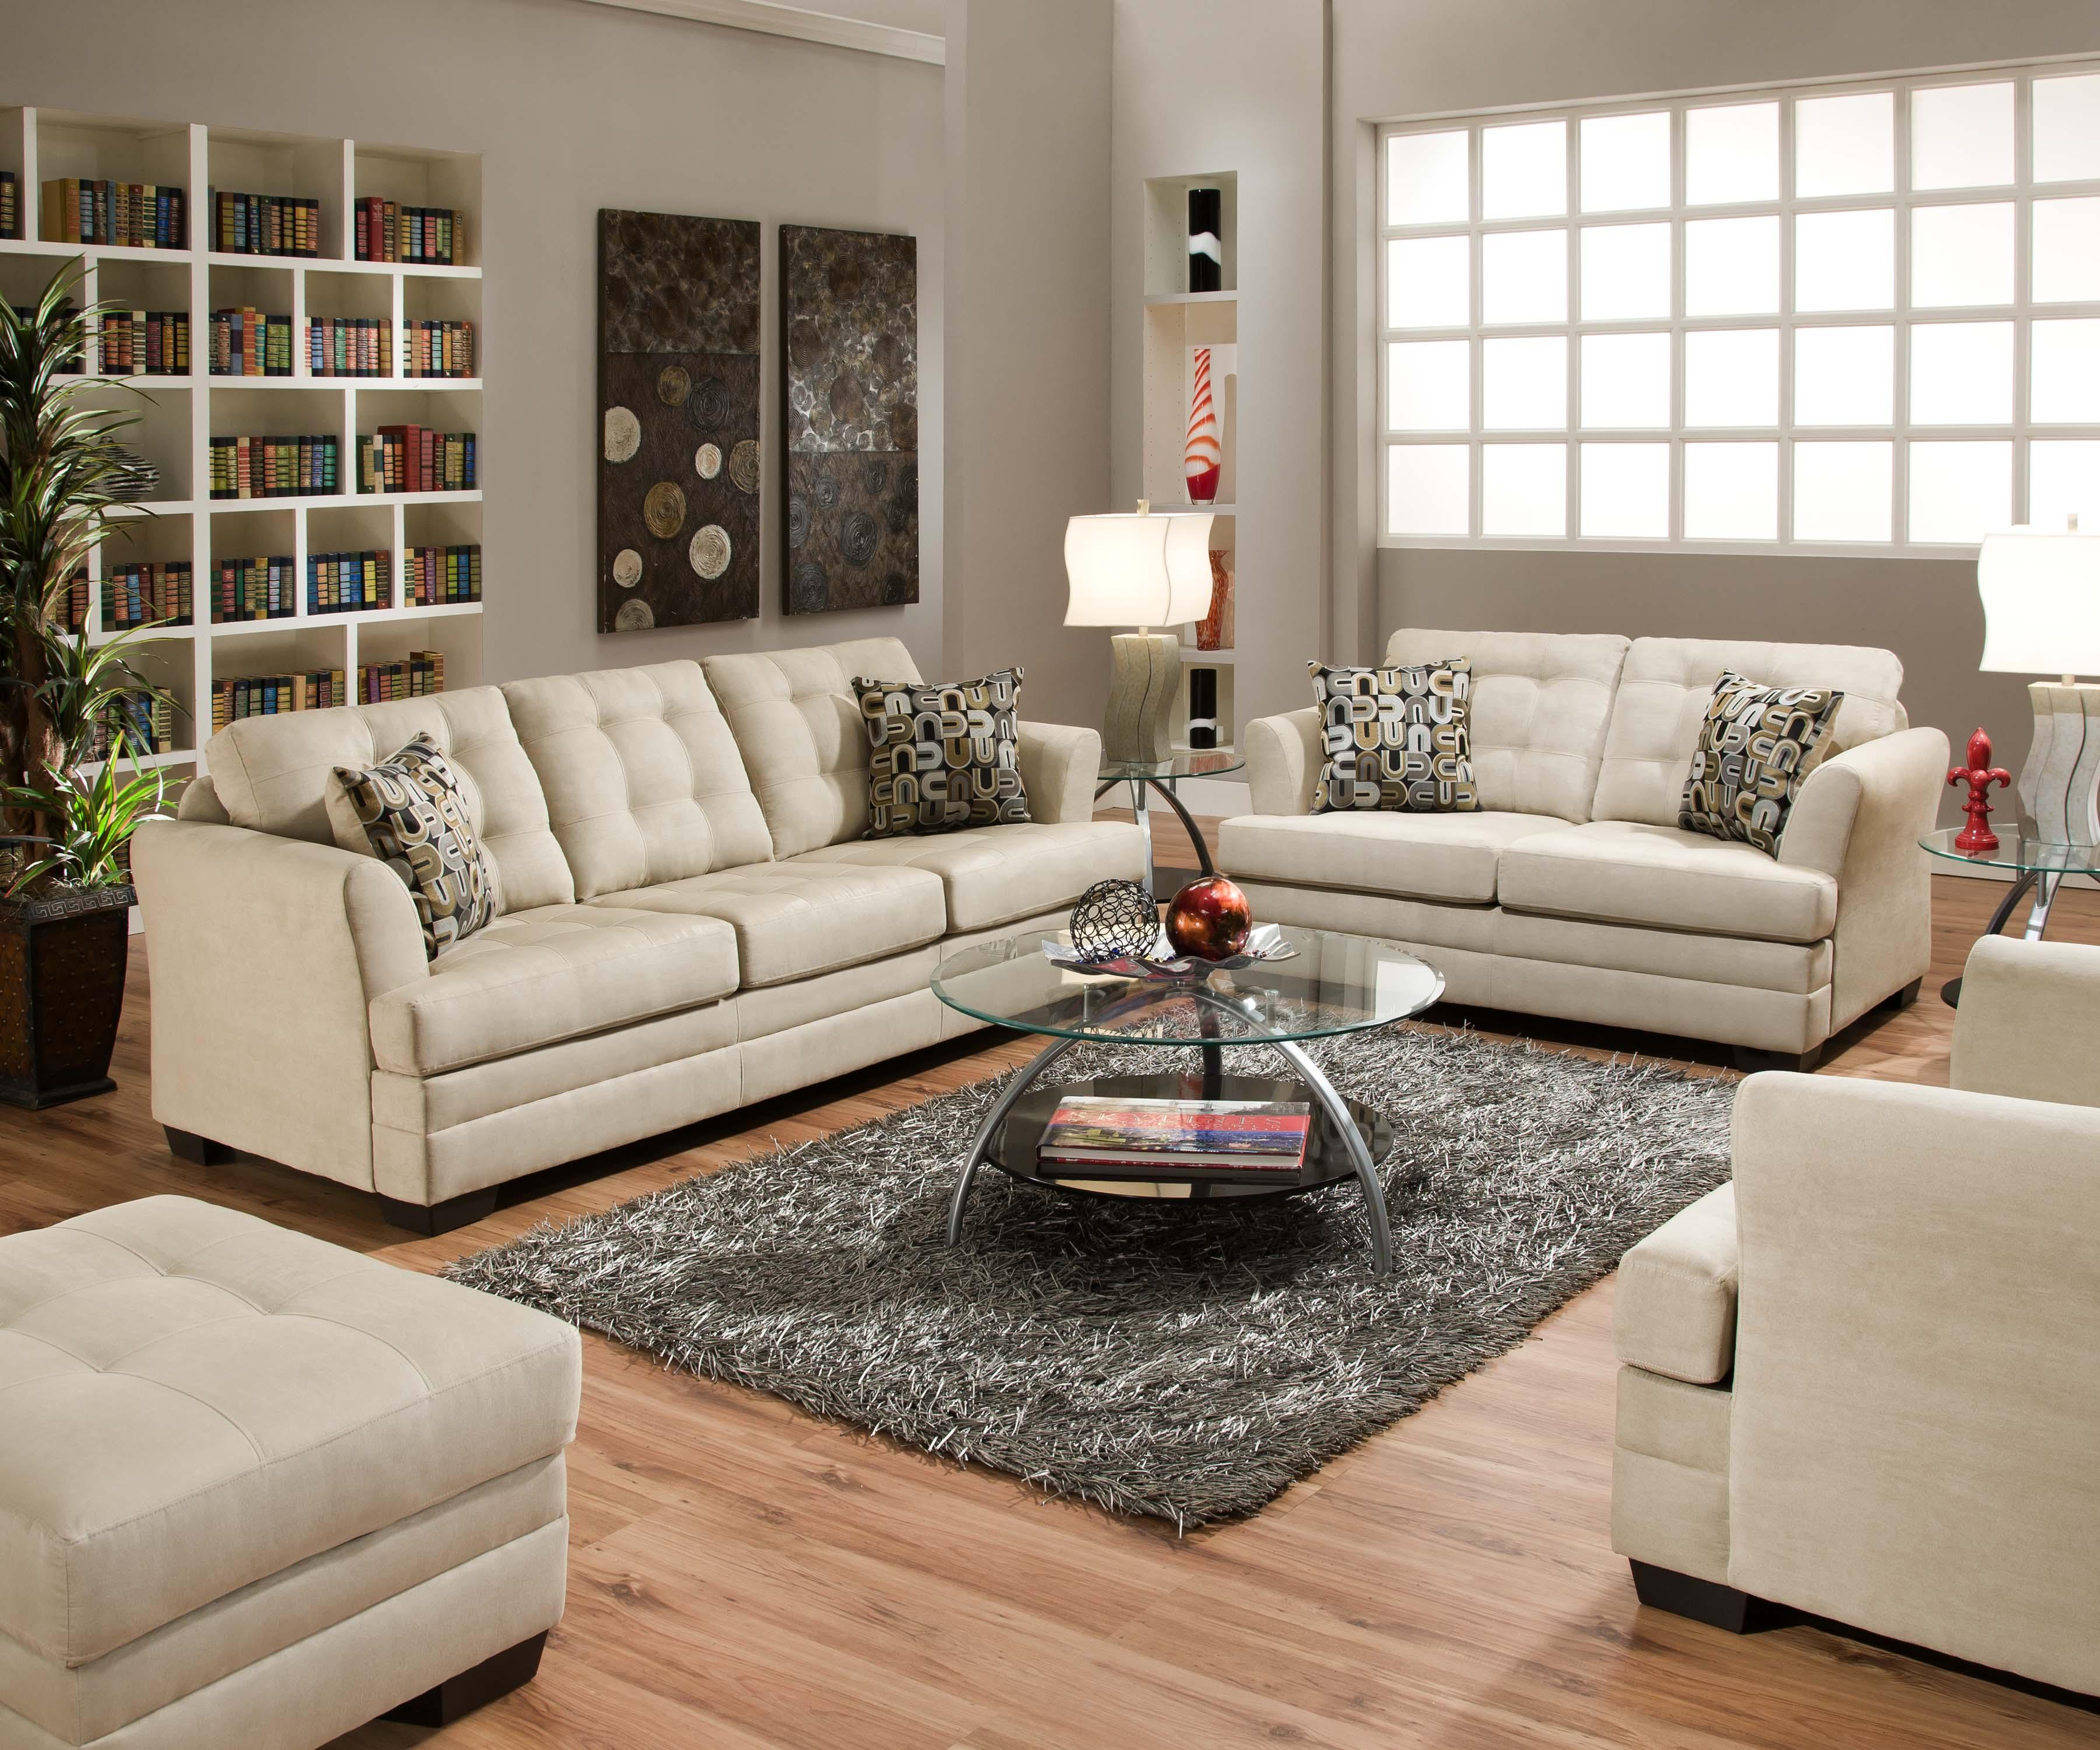 Simmons upholstery 2057 2057twinsleeper contemporary twin - Cojines decorativos para sofas ...